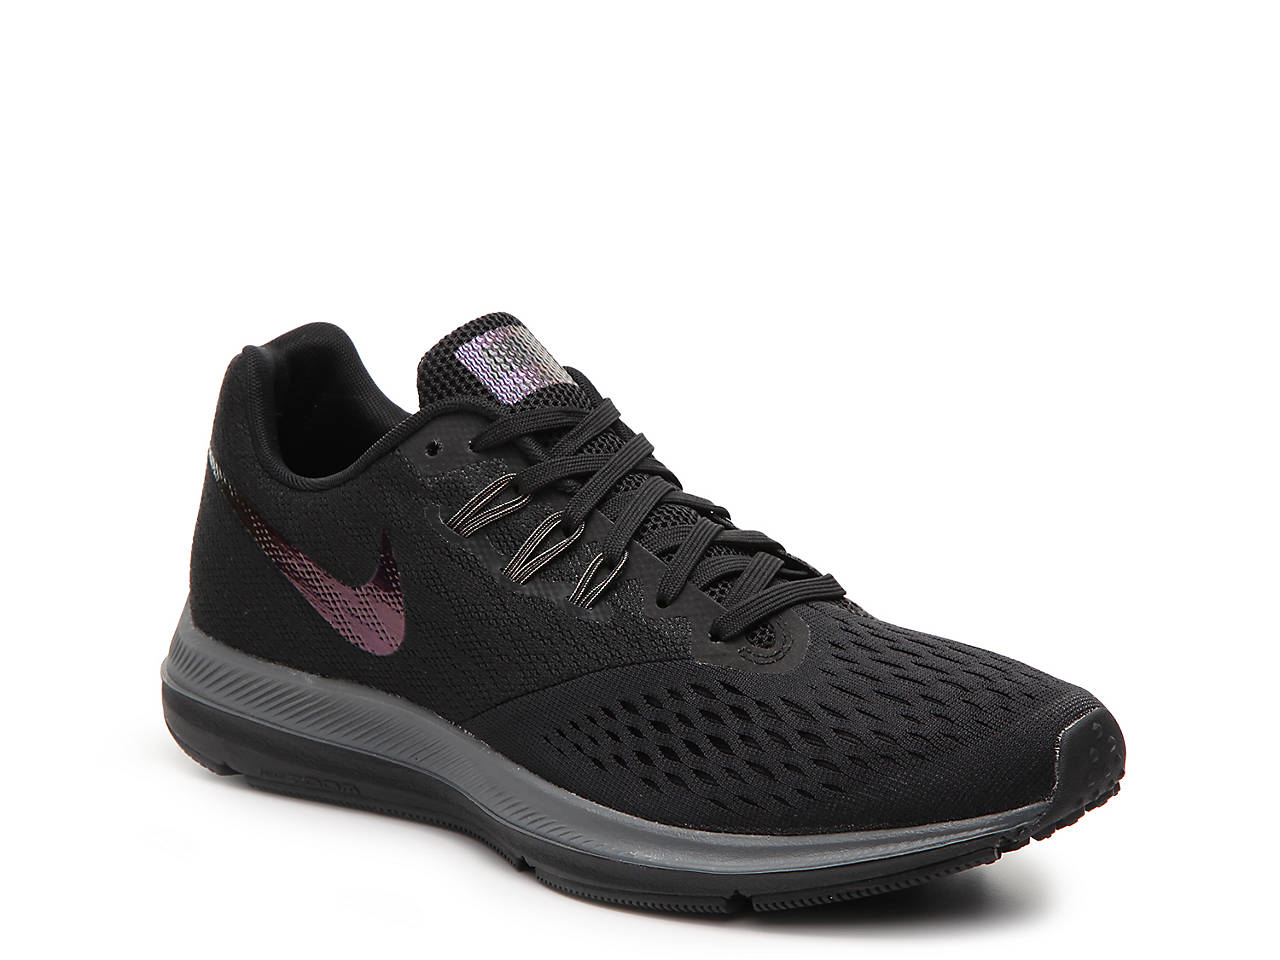 26b47852fd40 Nike Zoom Winflo 4 Lightweight Running Shoe - Women s Women s Shoes ...